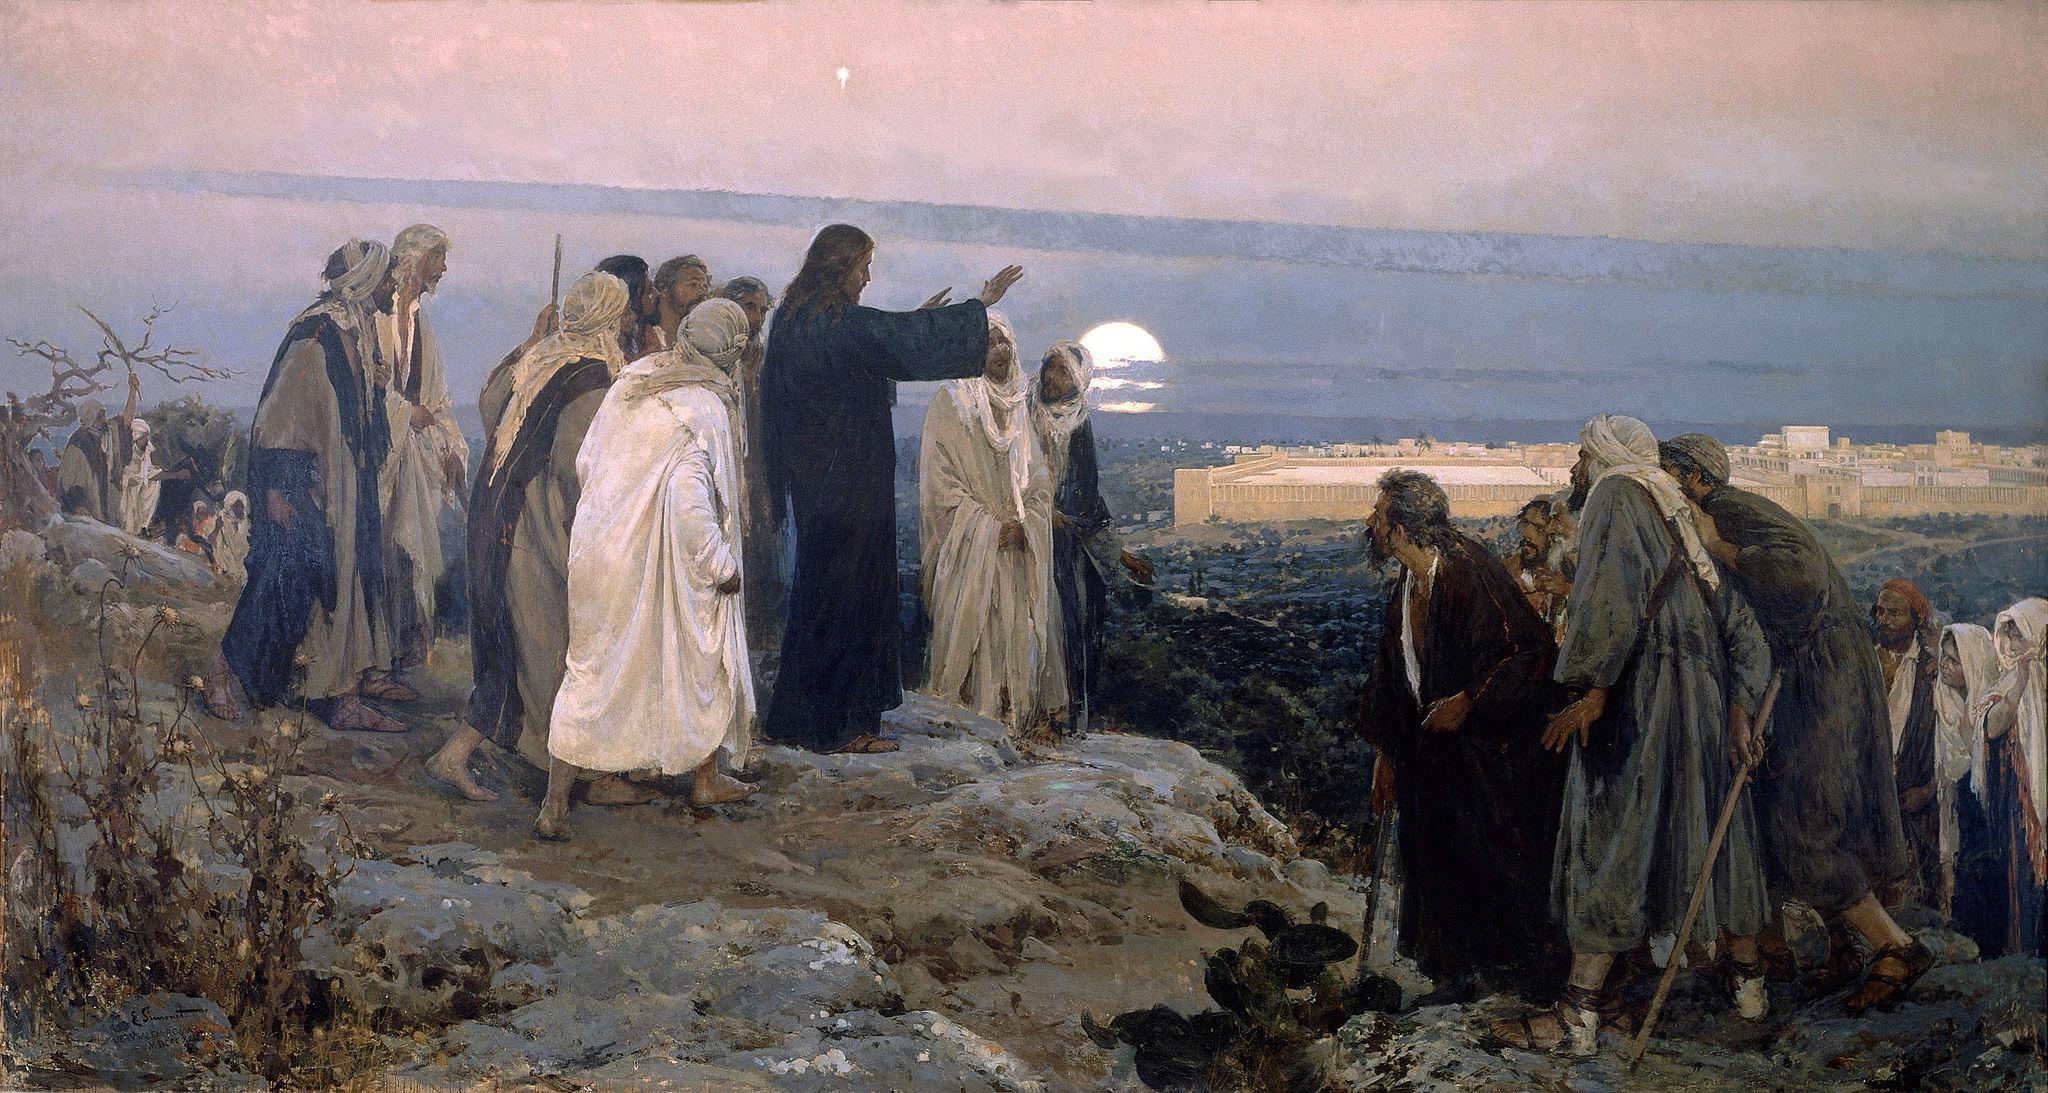 Jesus upon the Mount of Olives overlooking Jerusalem